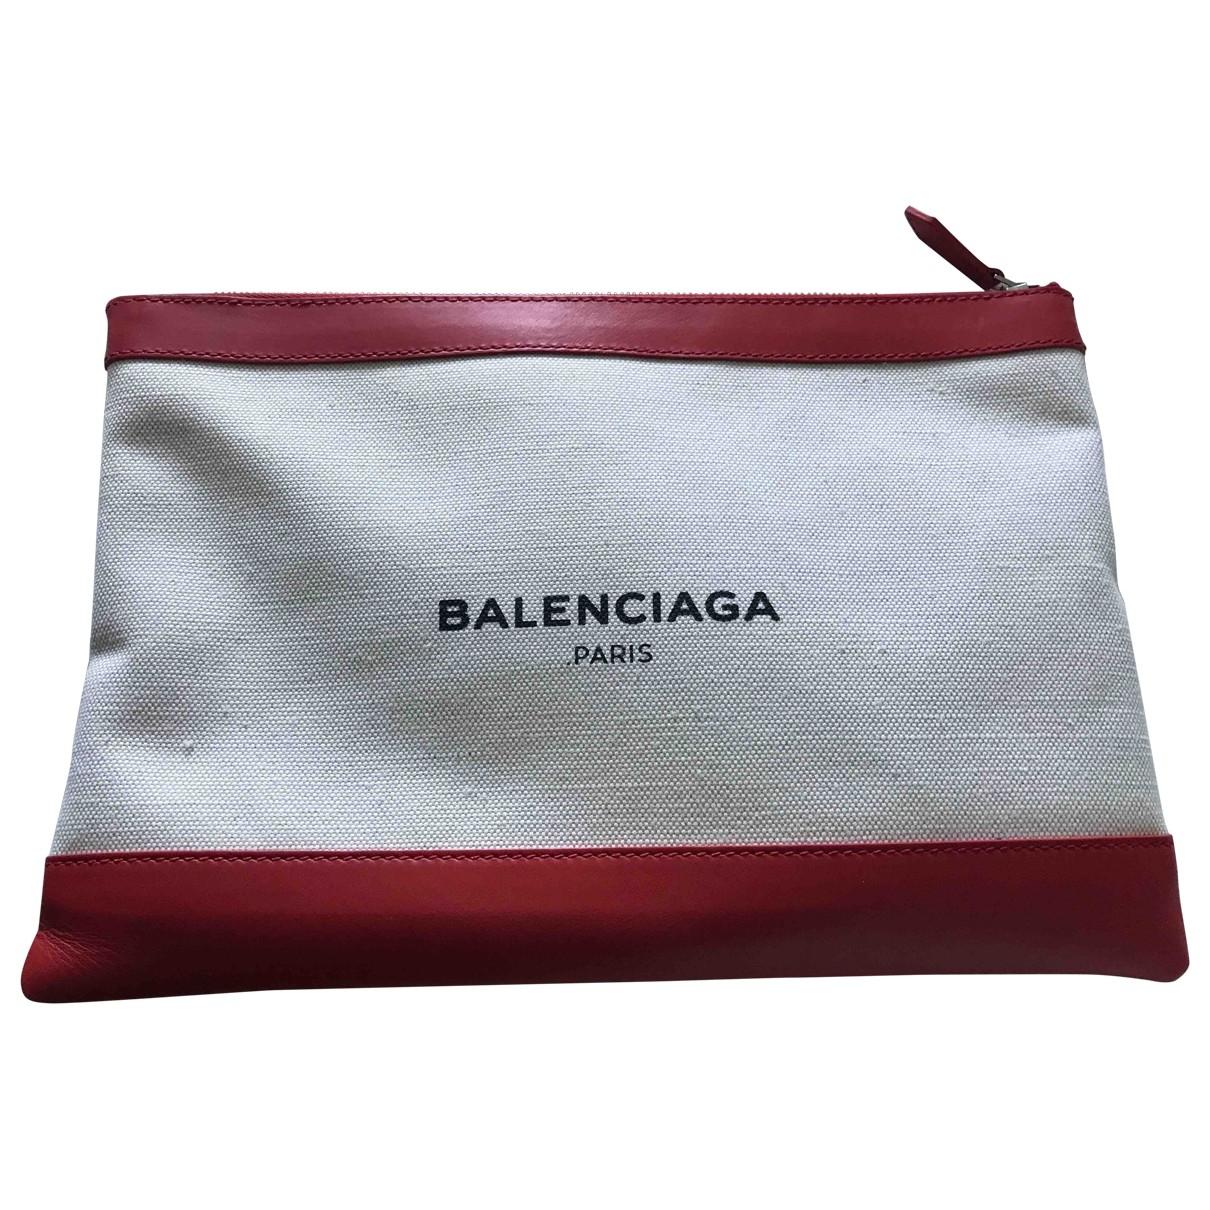 Balenciaga \N Clutch in  Weiss Leinen